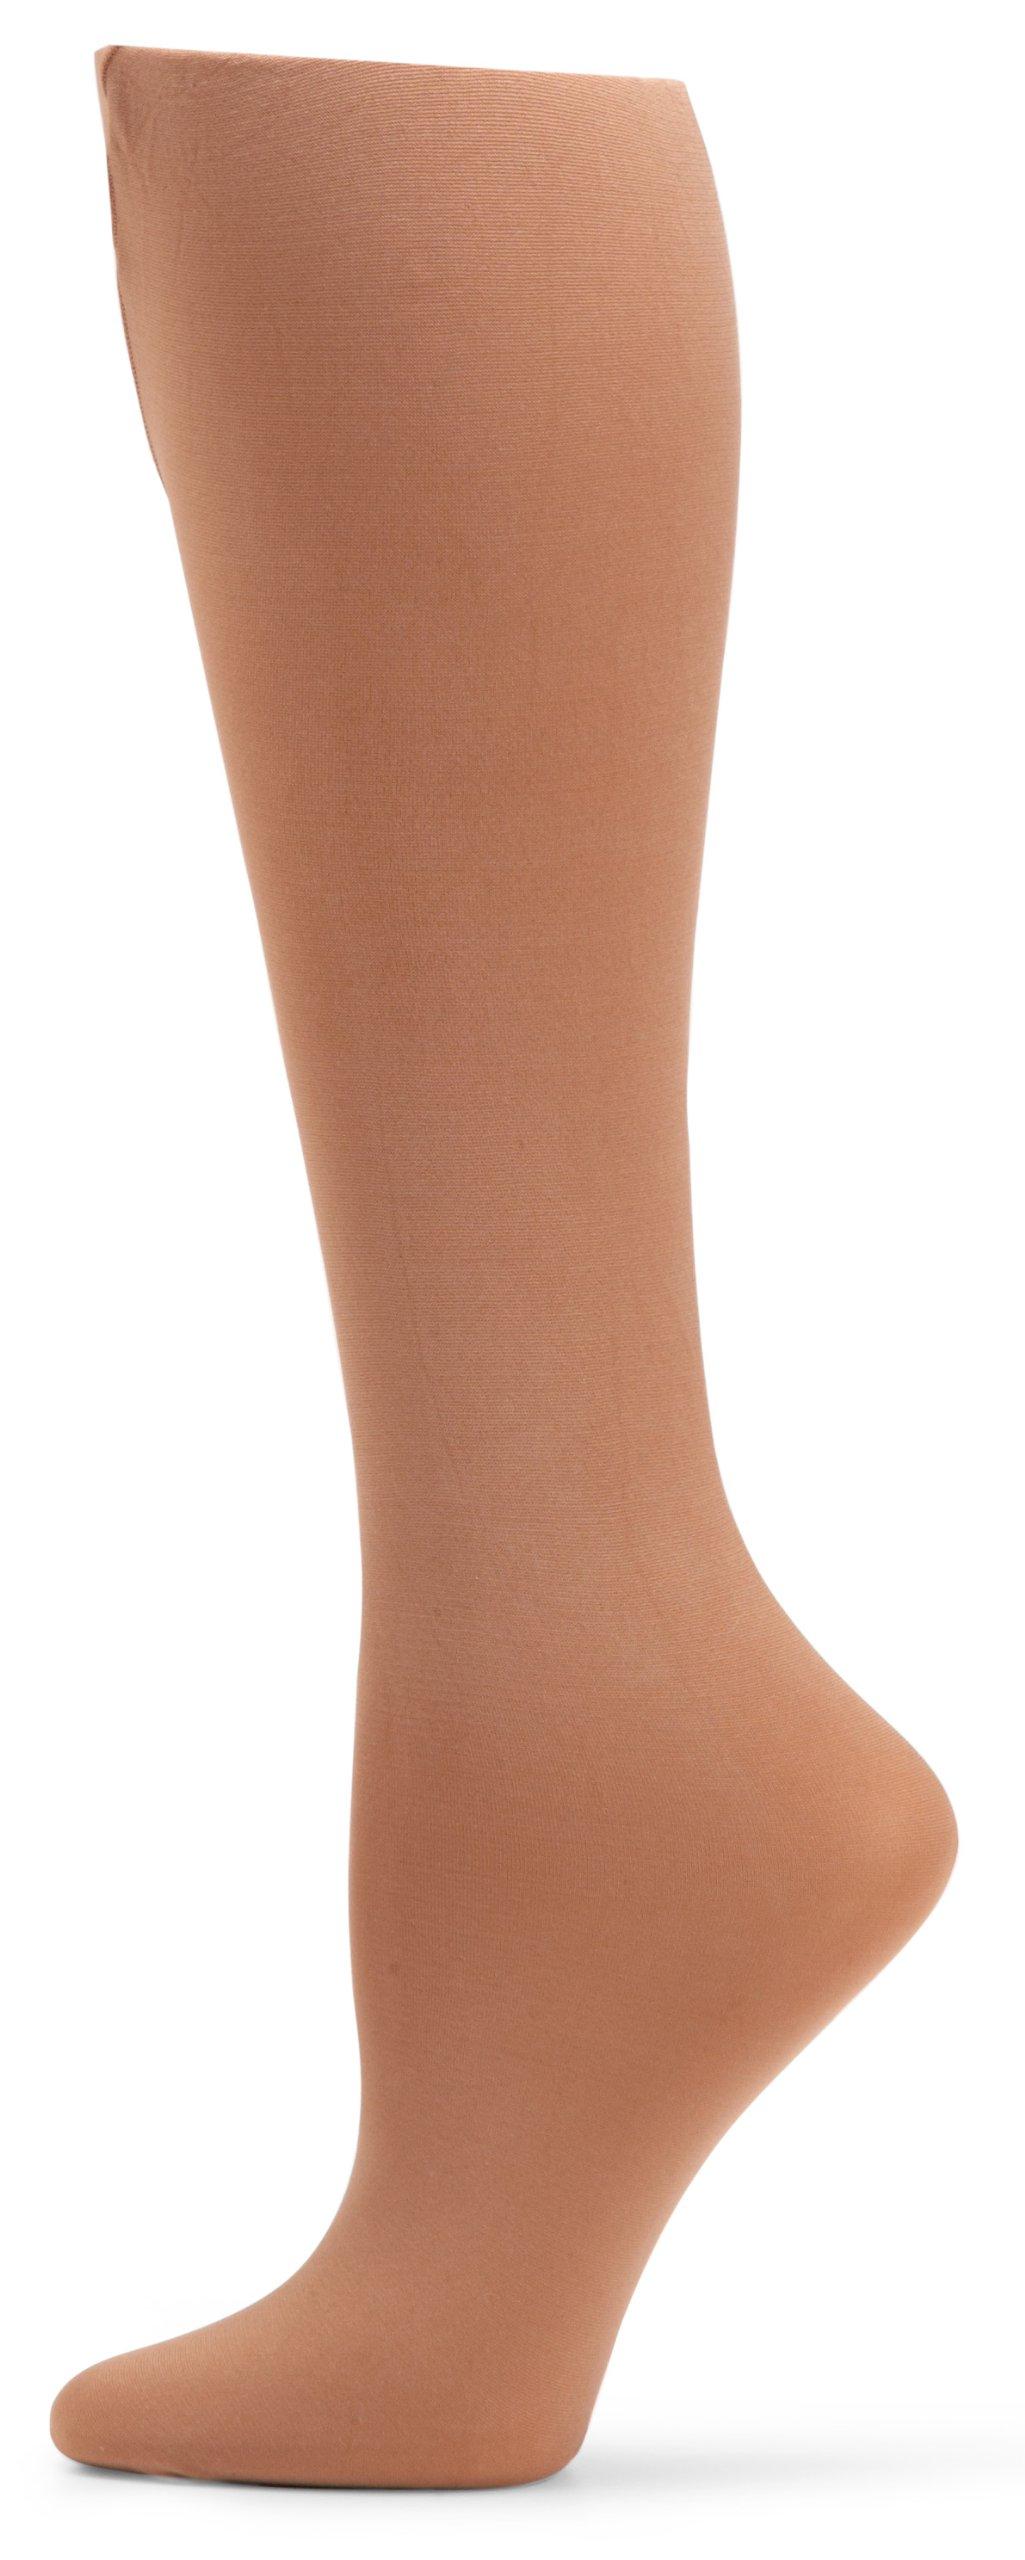 Suntan Full Footed Tights Danskin 703 Girl/'s Size Small 4-6